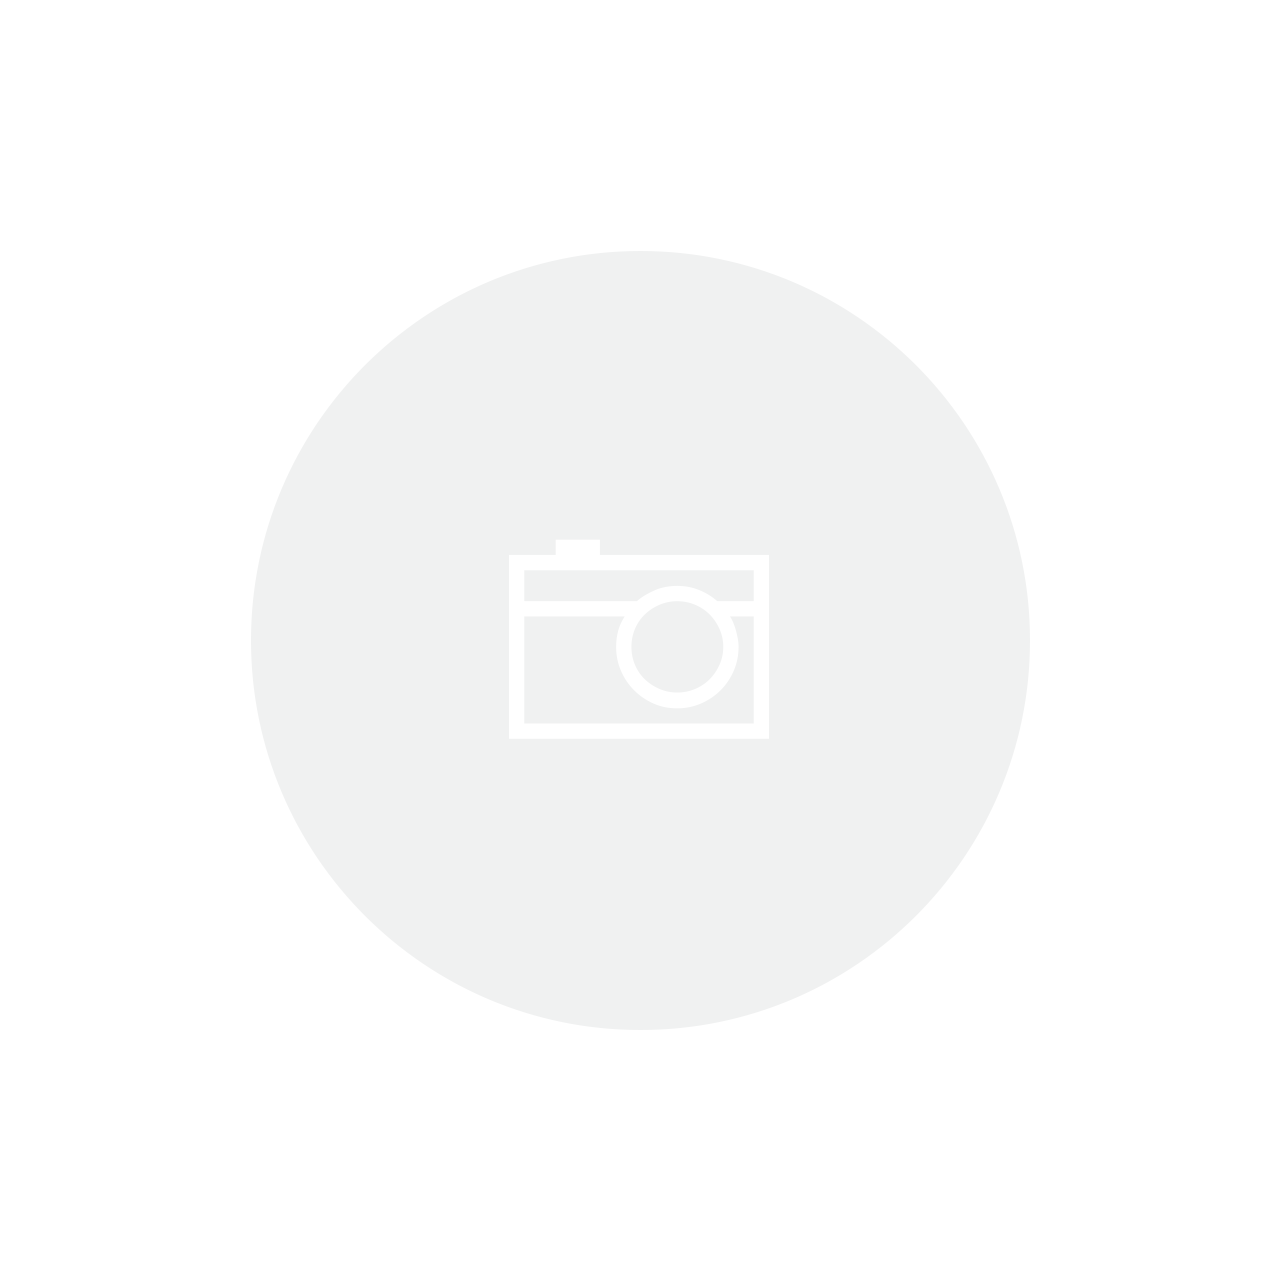 Coifa Inox Vidro New Vetro Flex 75cm 220v Tramontina